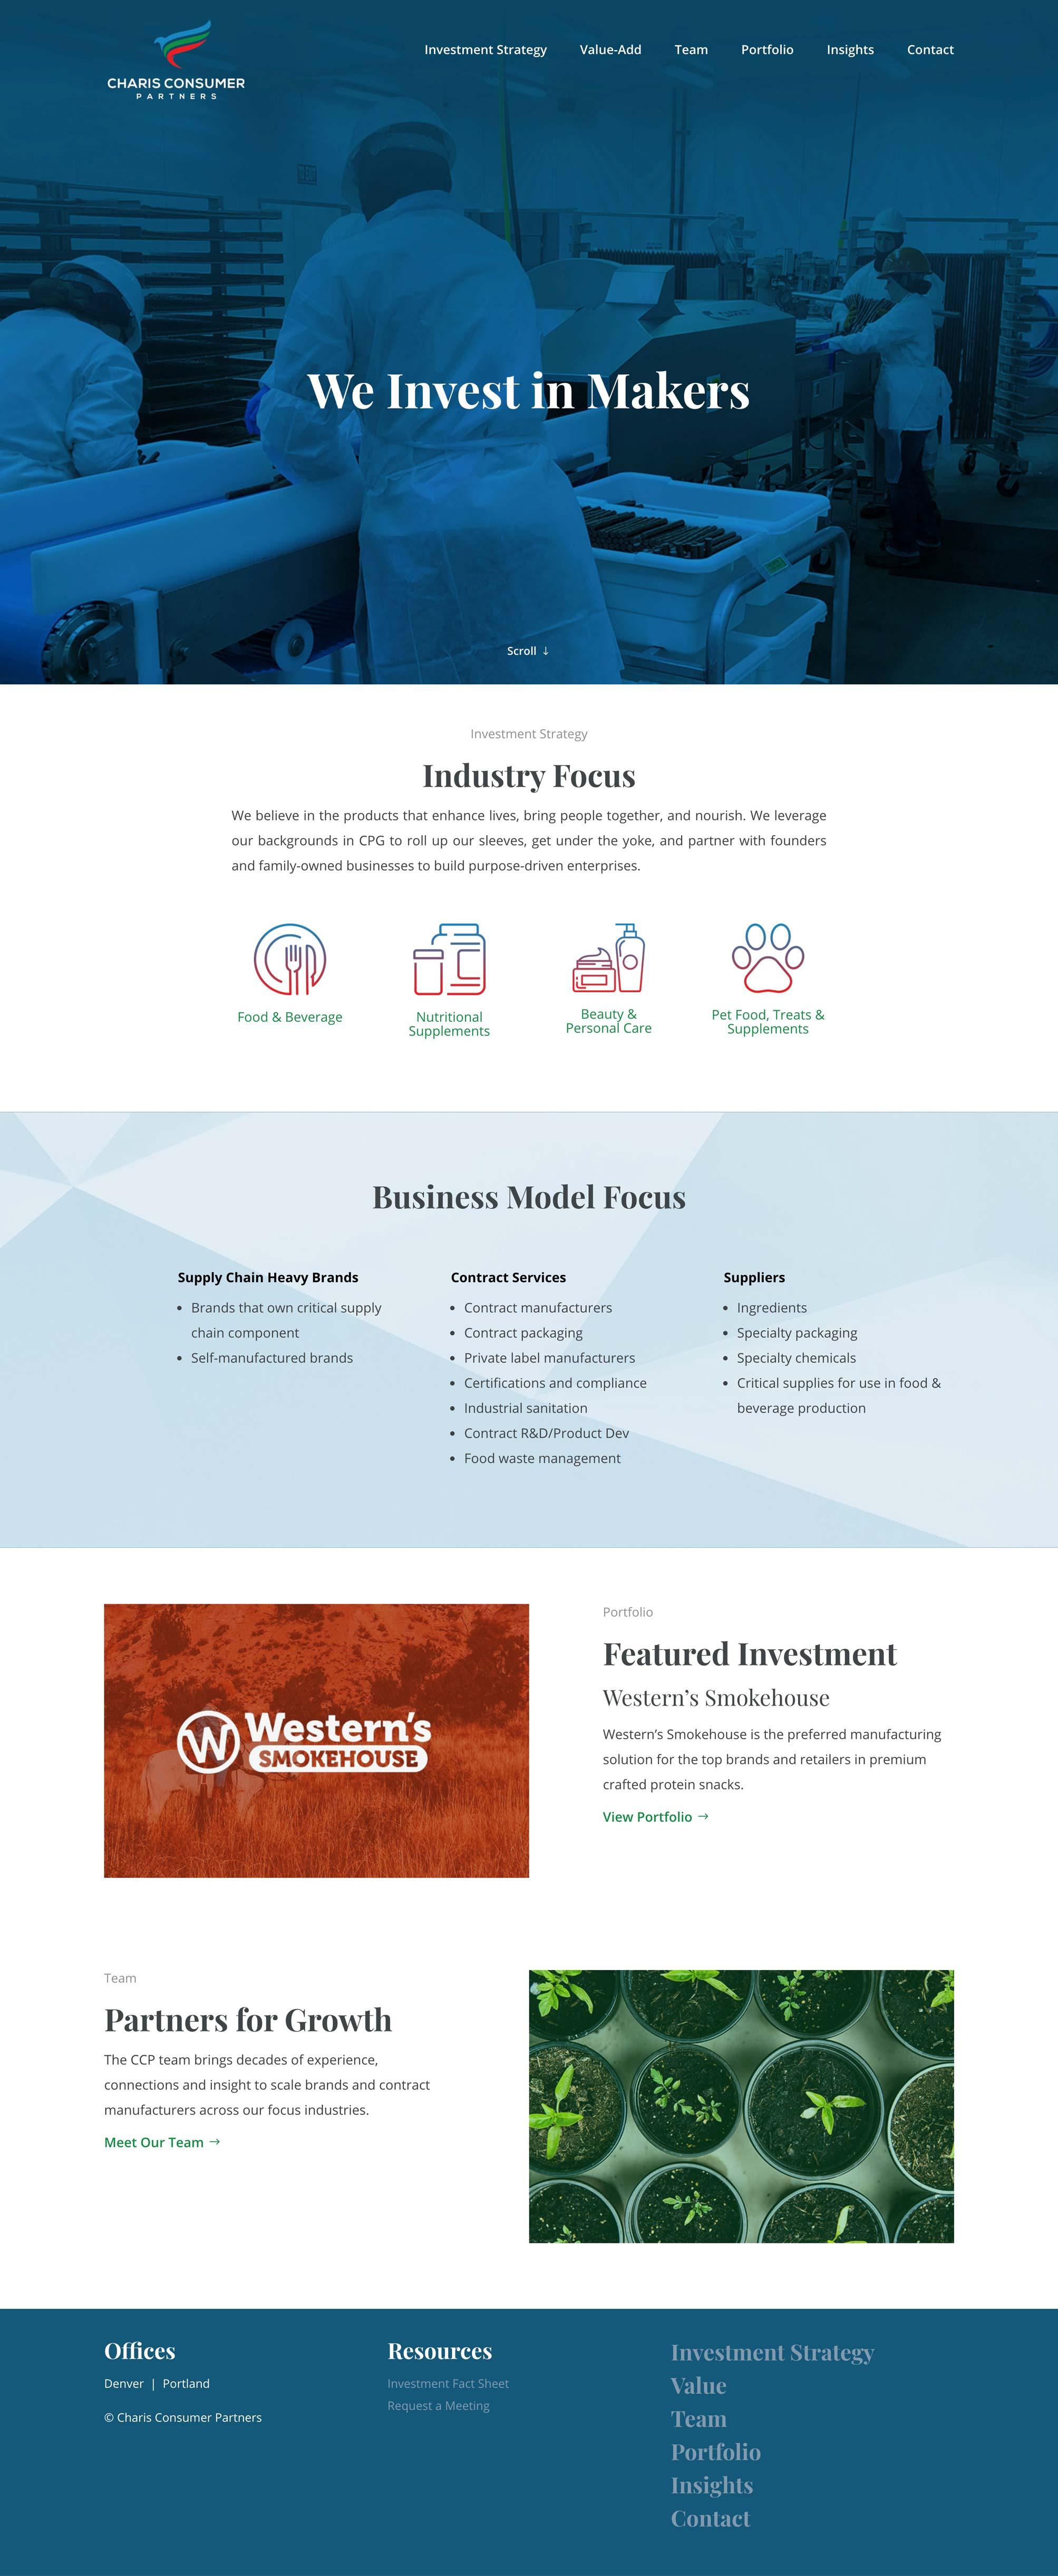 Charis Consumer Partners Homepage Design